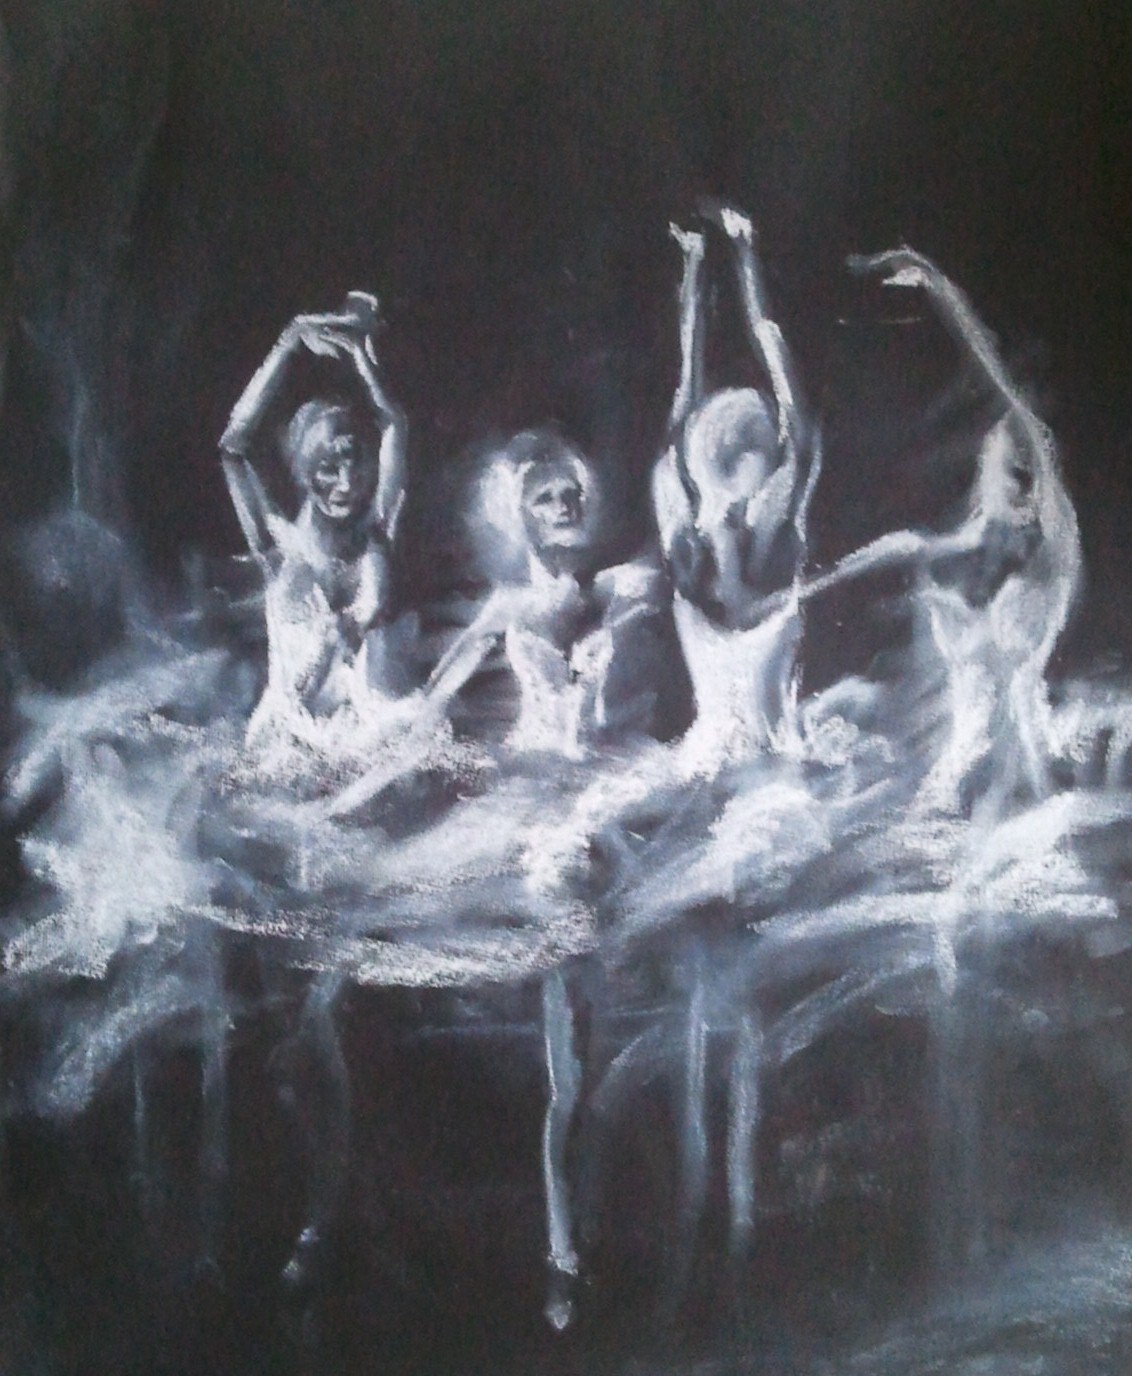 Baletky Zbozi Prodejce Frosta Fler Cz